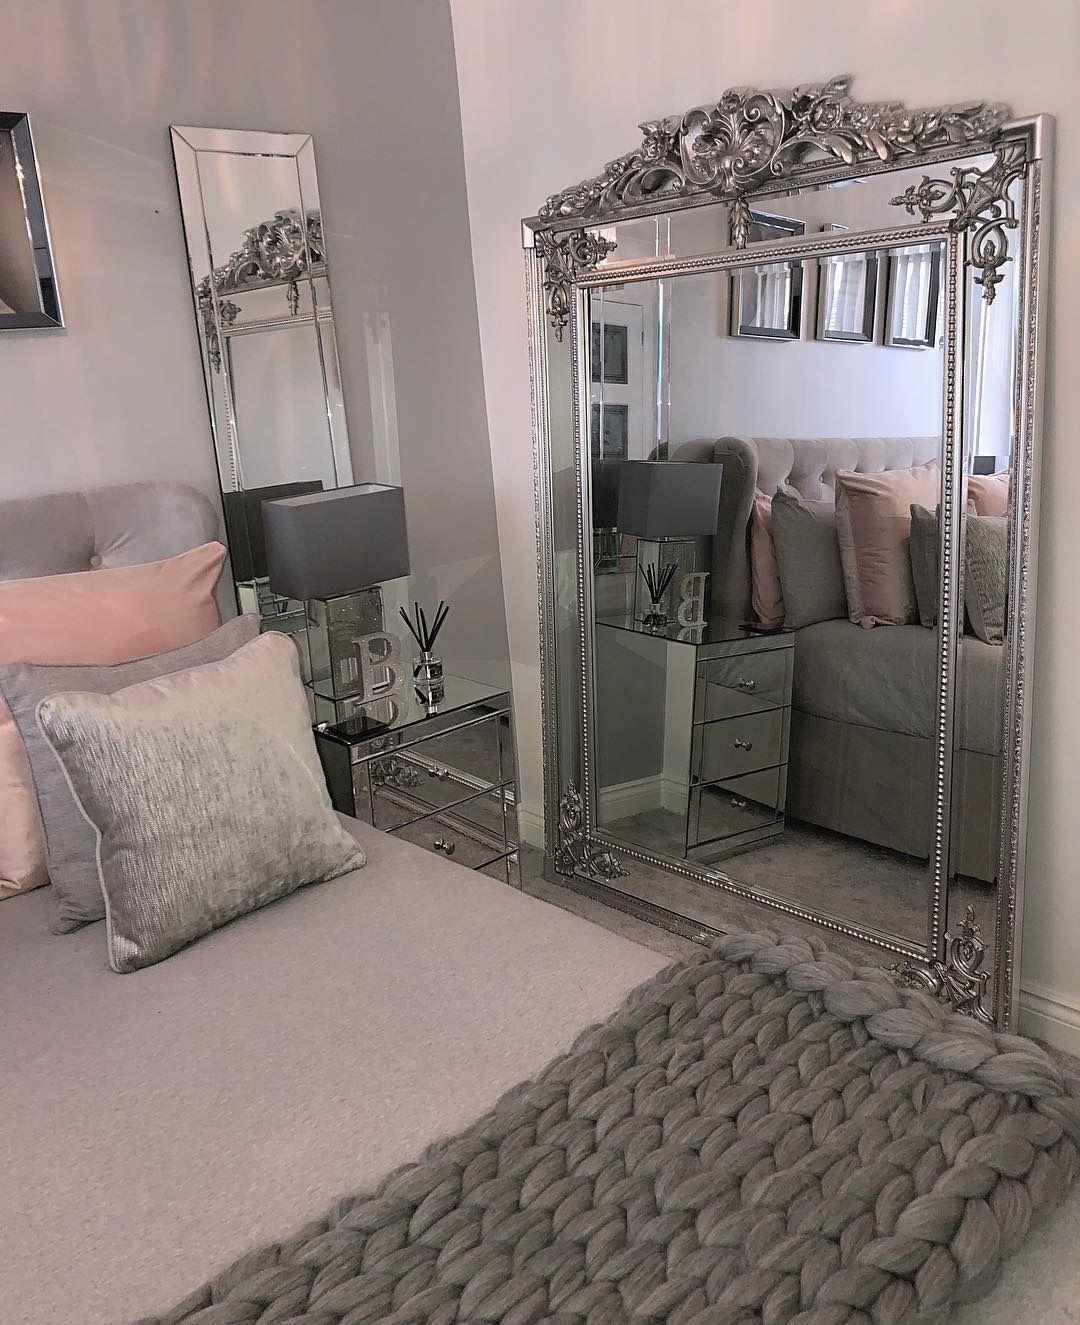 pinterest: @ nandeezy †  Home decor, Home, Bedroom decor